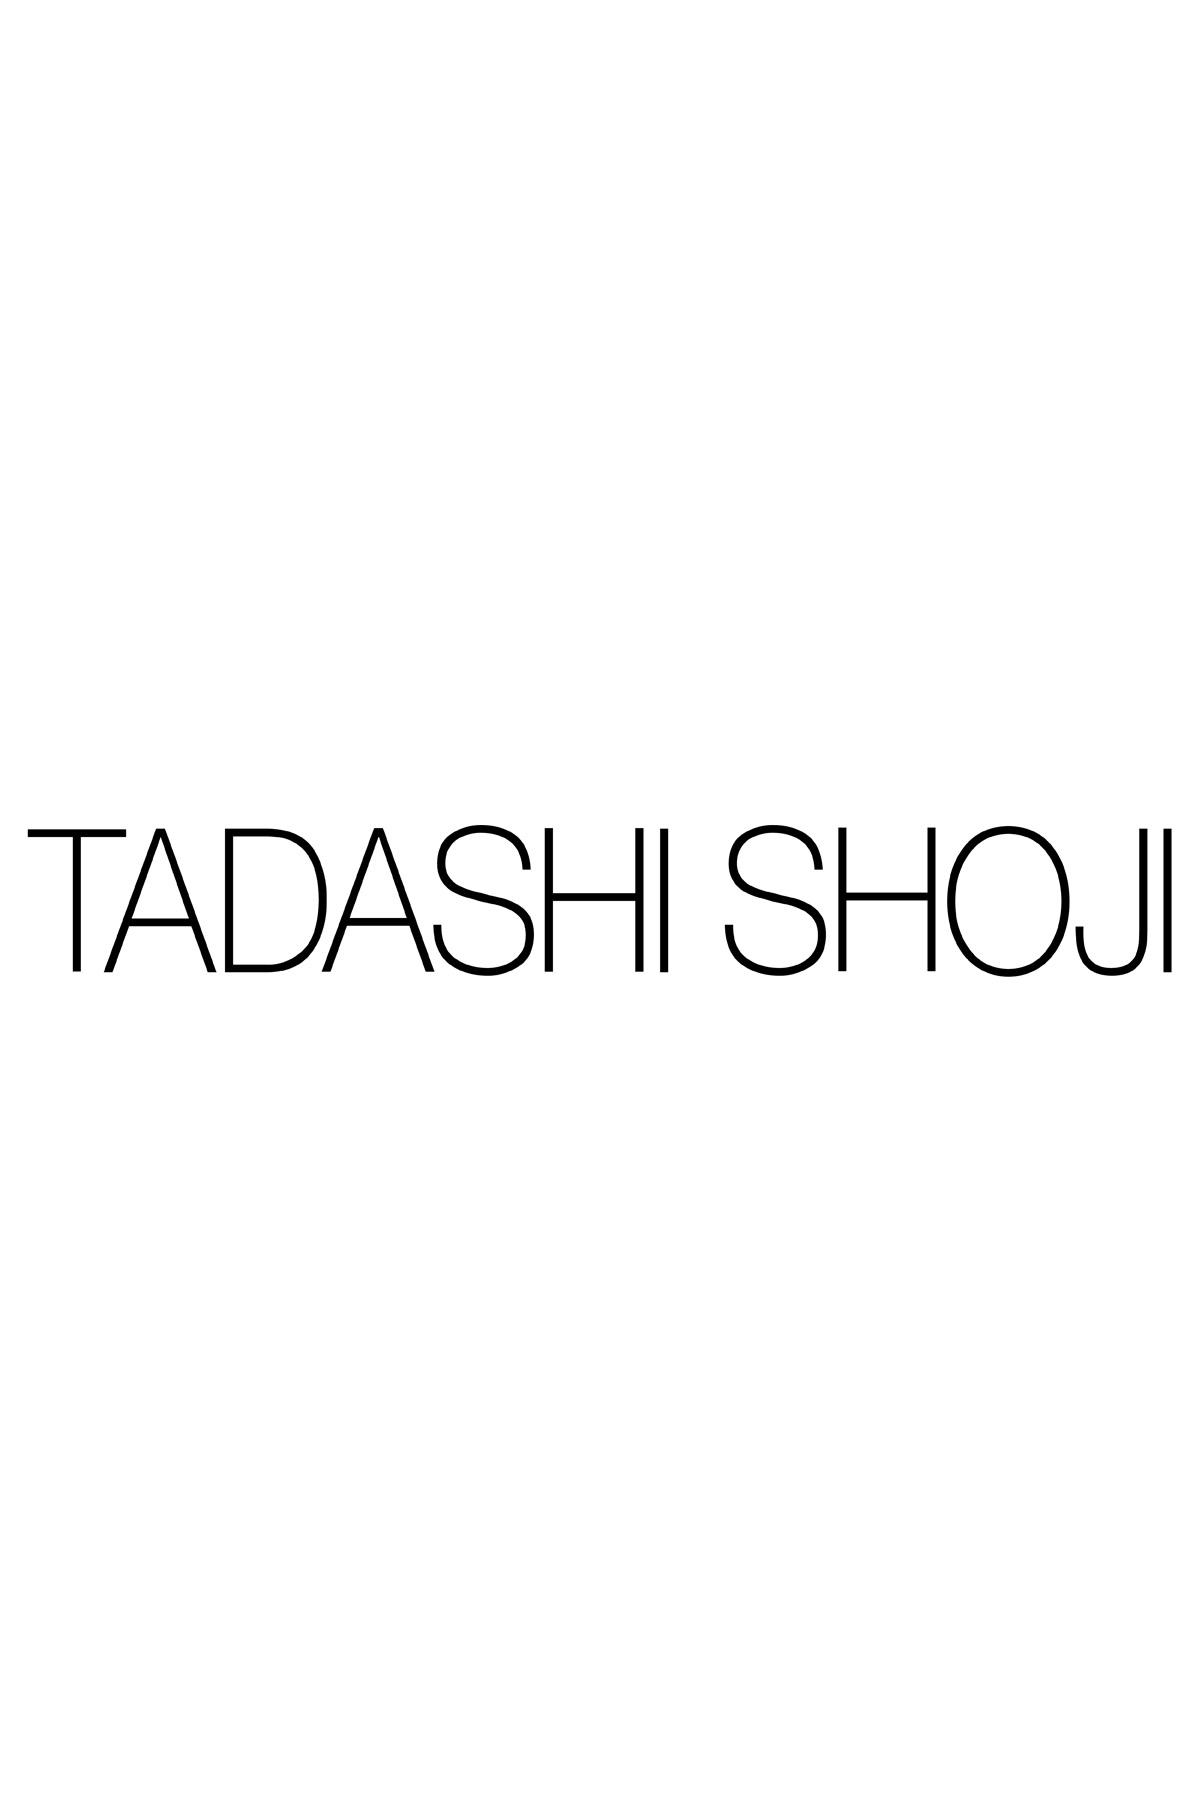 Corded Embroidery on Tulle Cap Sleeve Dress - PETITE | Tadashi Shoji